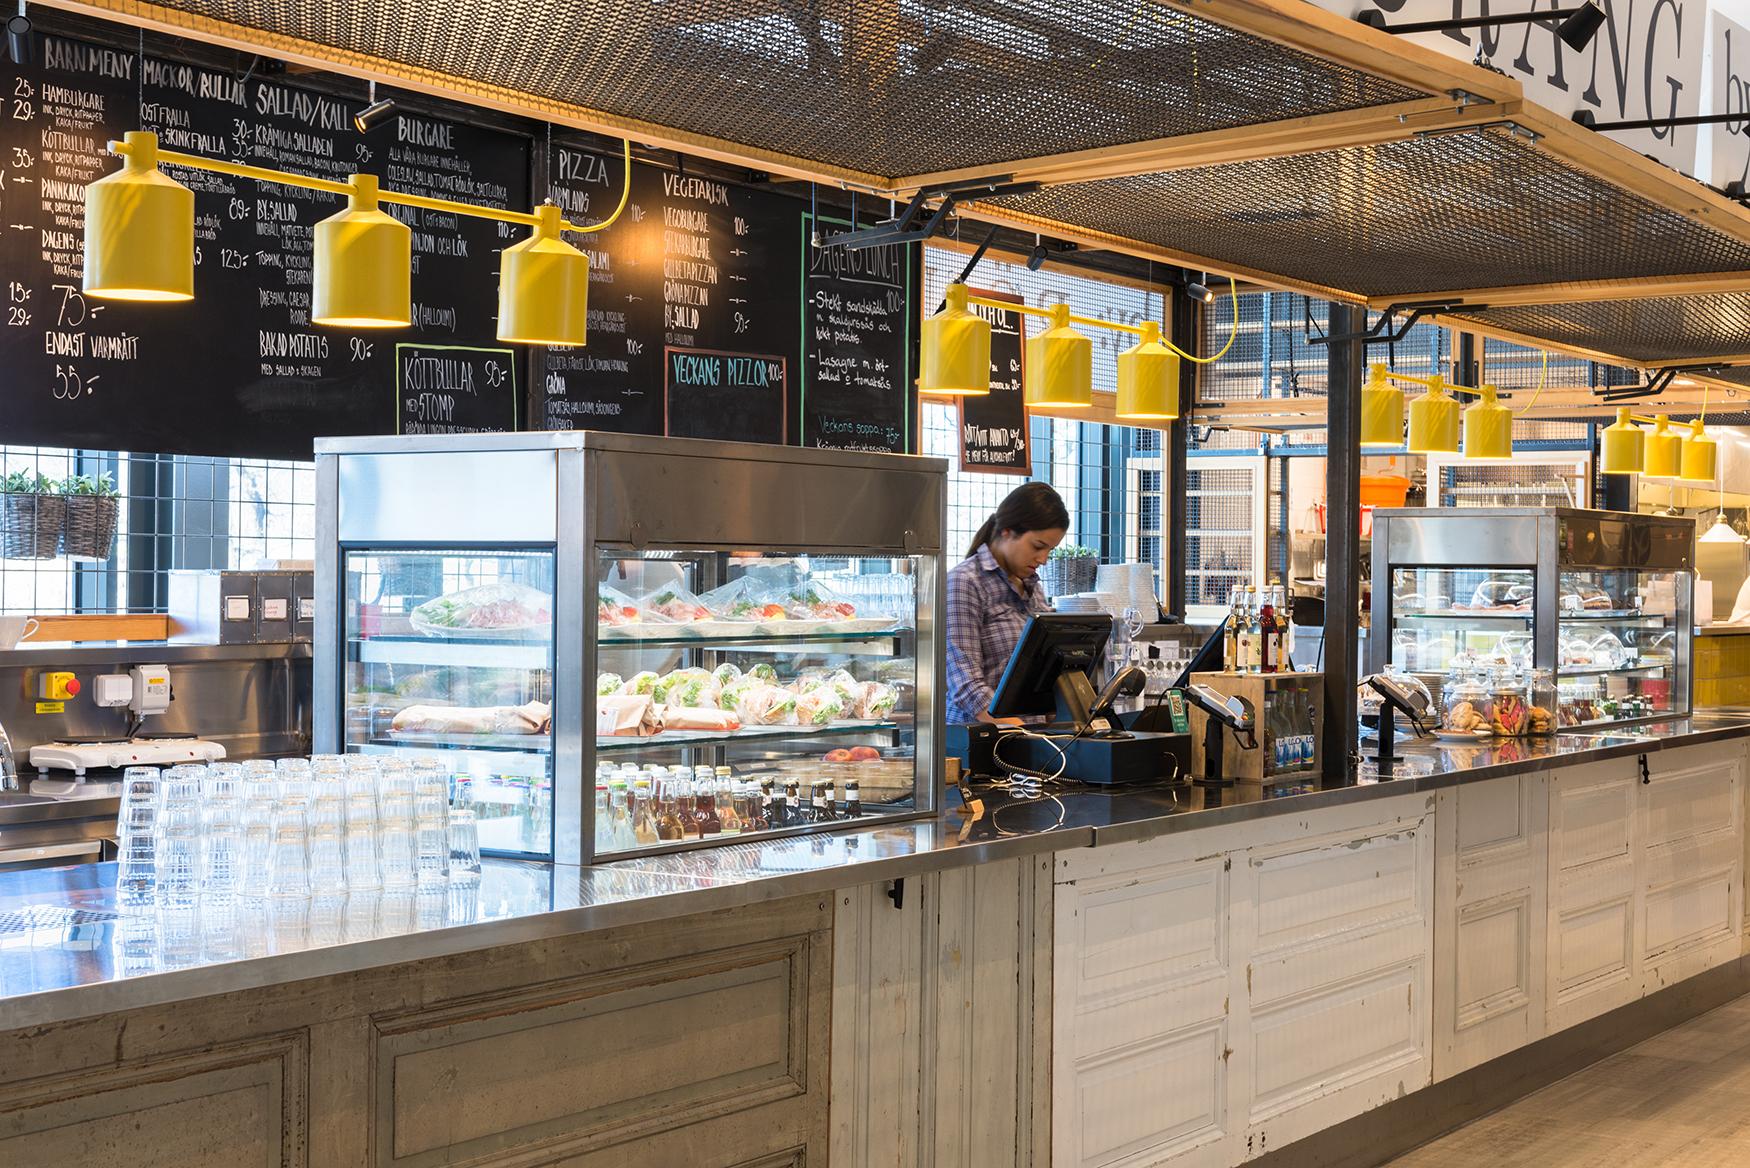 SiloTrio-IkeaShoppingcenterKungensKurva2.jpg